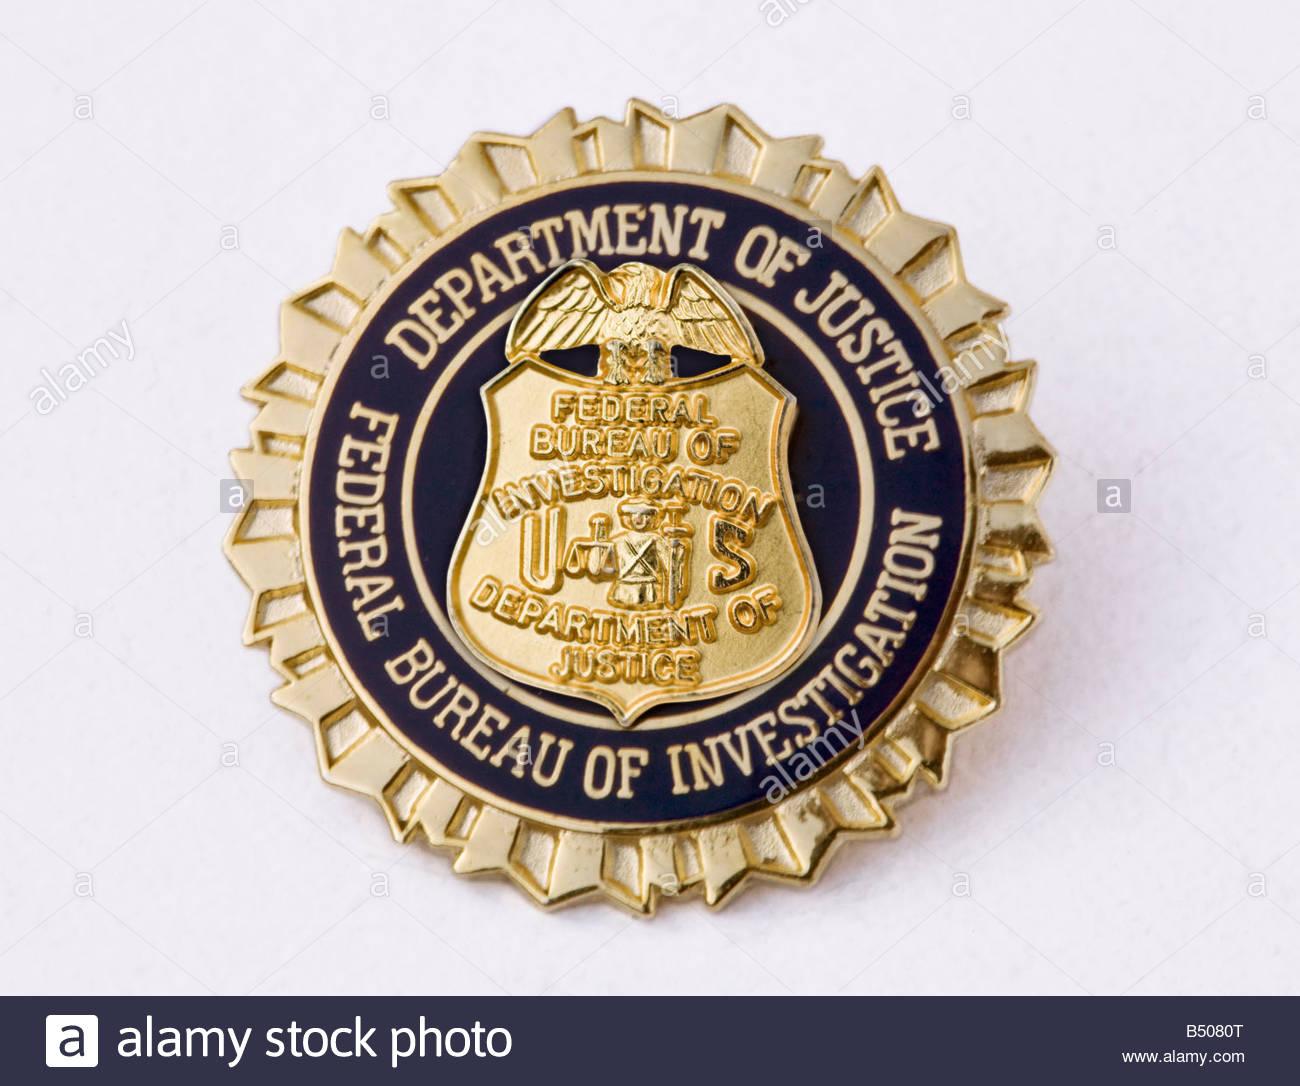 Fbi badge stock photos fbi badge stock images alamy - Fbi badge wallpaper ...